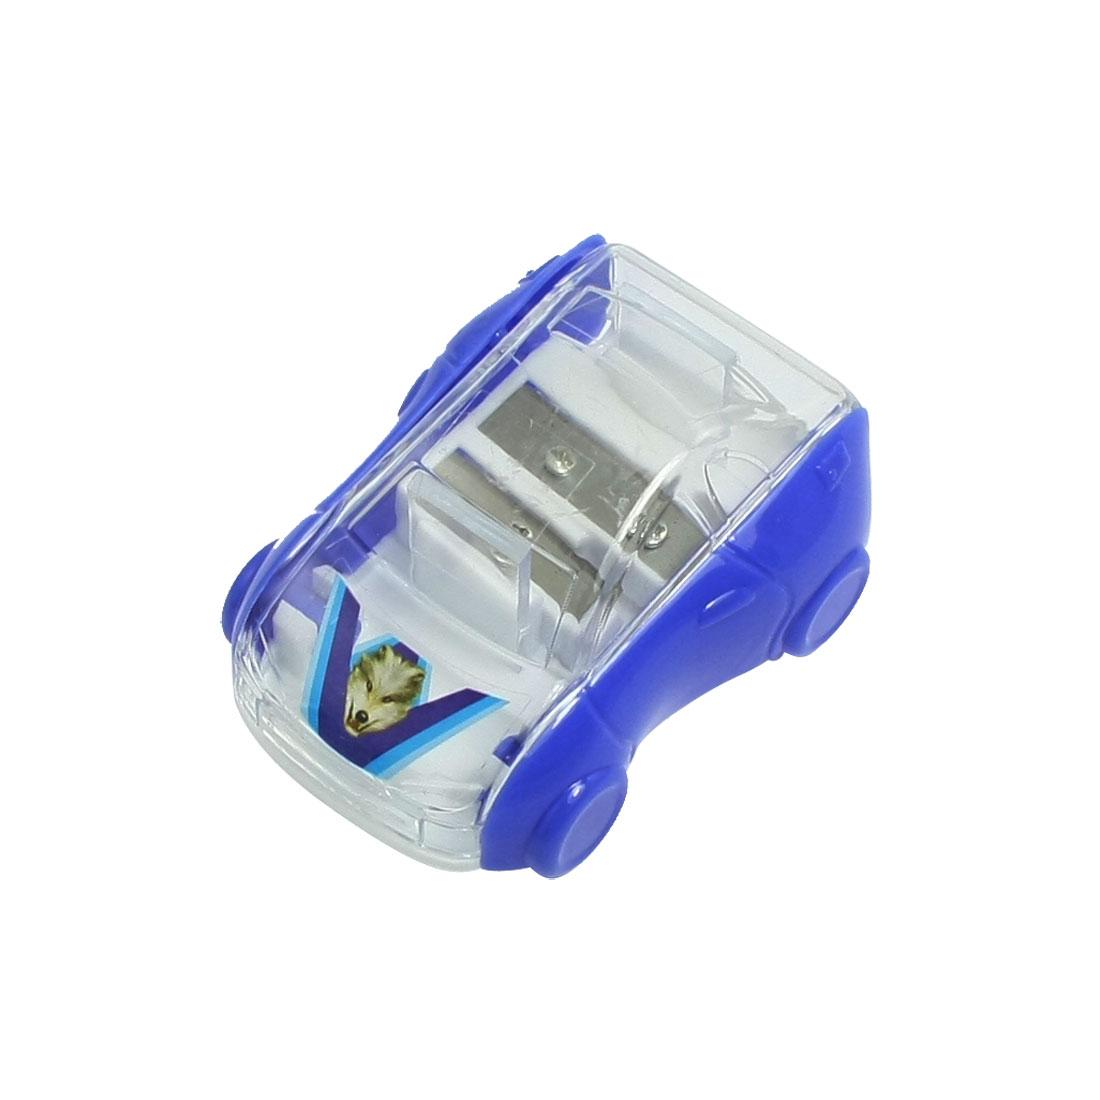 Blue Transparent Plastic Shell Double Holes Pencil Sharpener